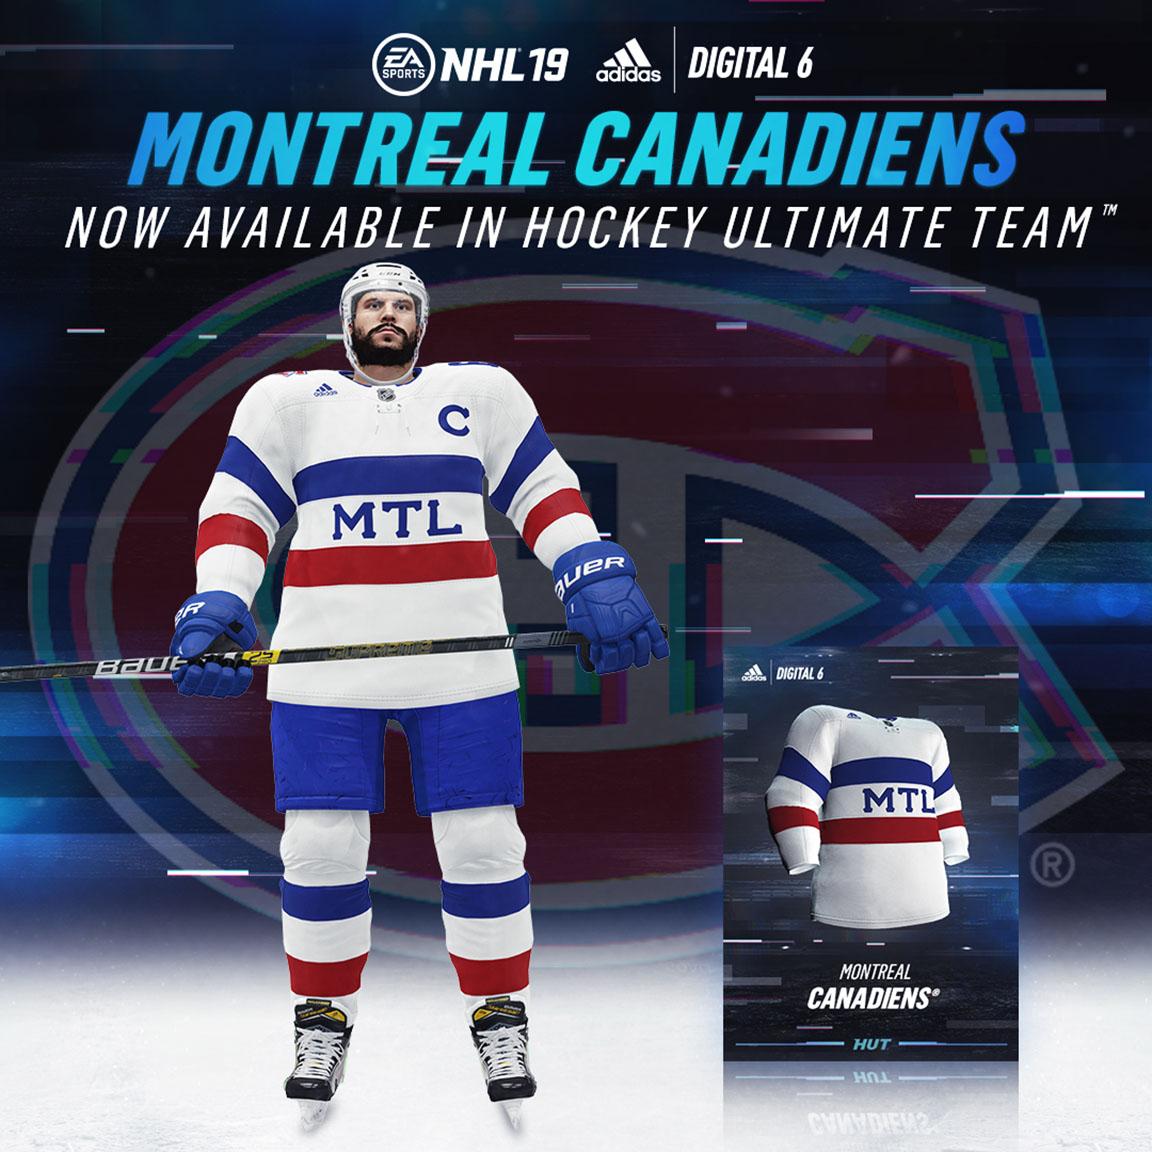 adidasHockey x EA_ Digital6_Canadiens_01.jpg